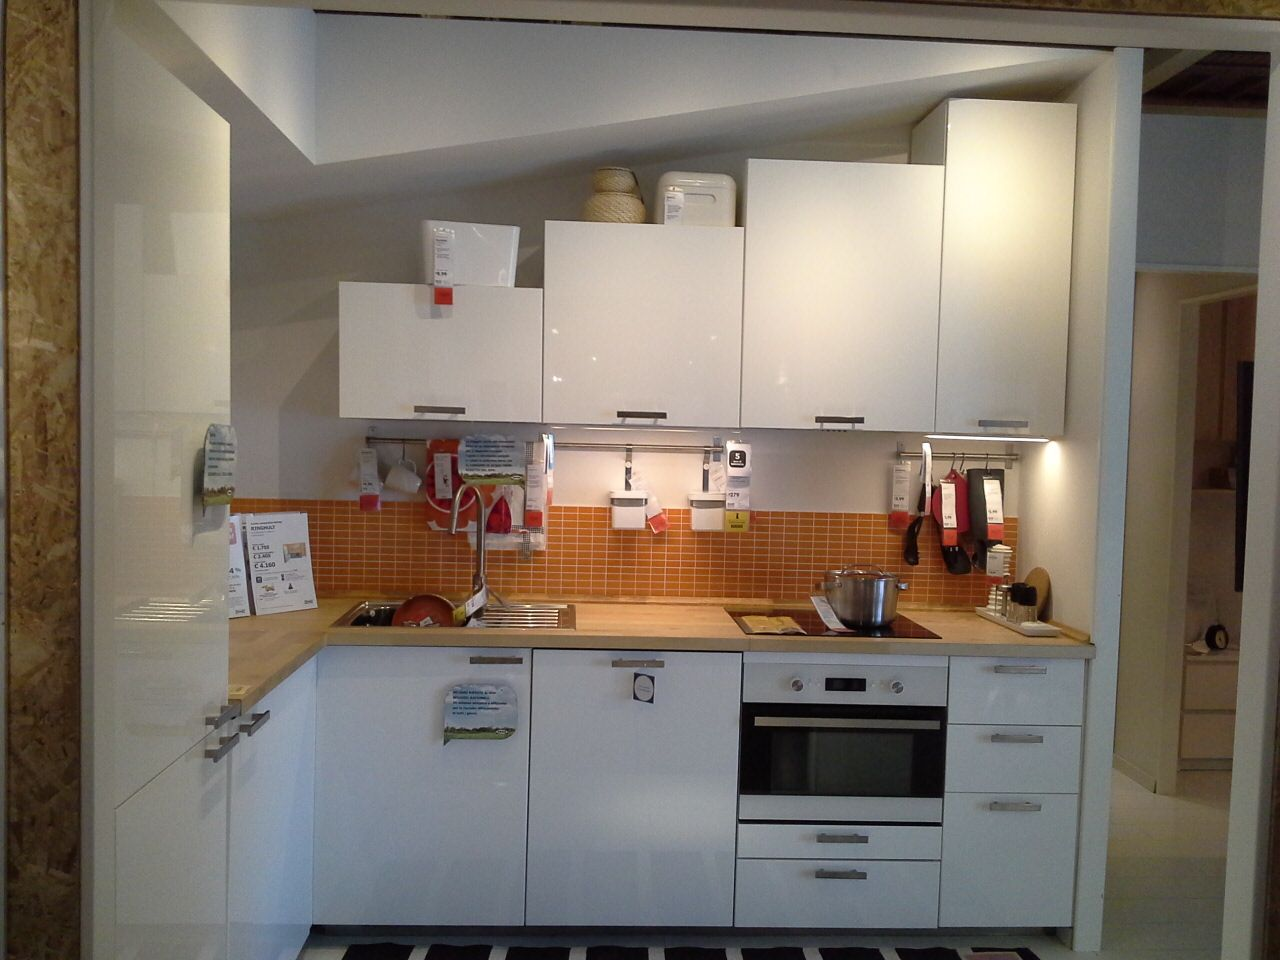 Colonna Dispensa Cucina Ikea pensili da cucina ikea